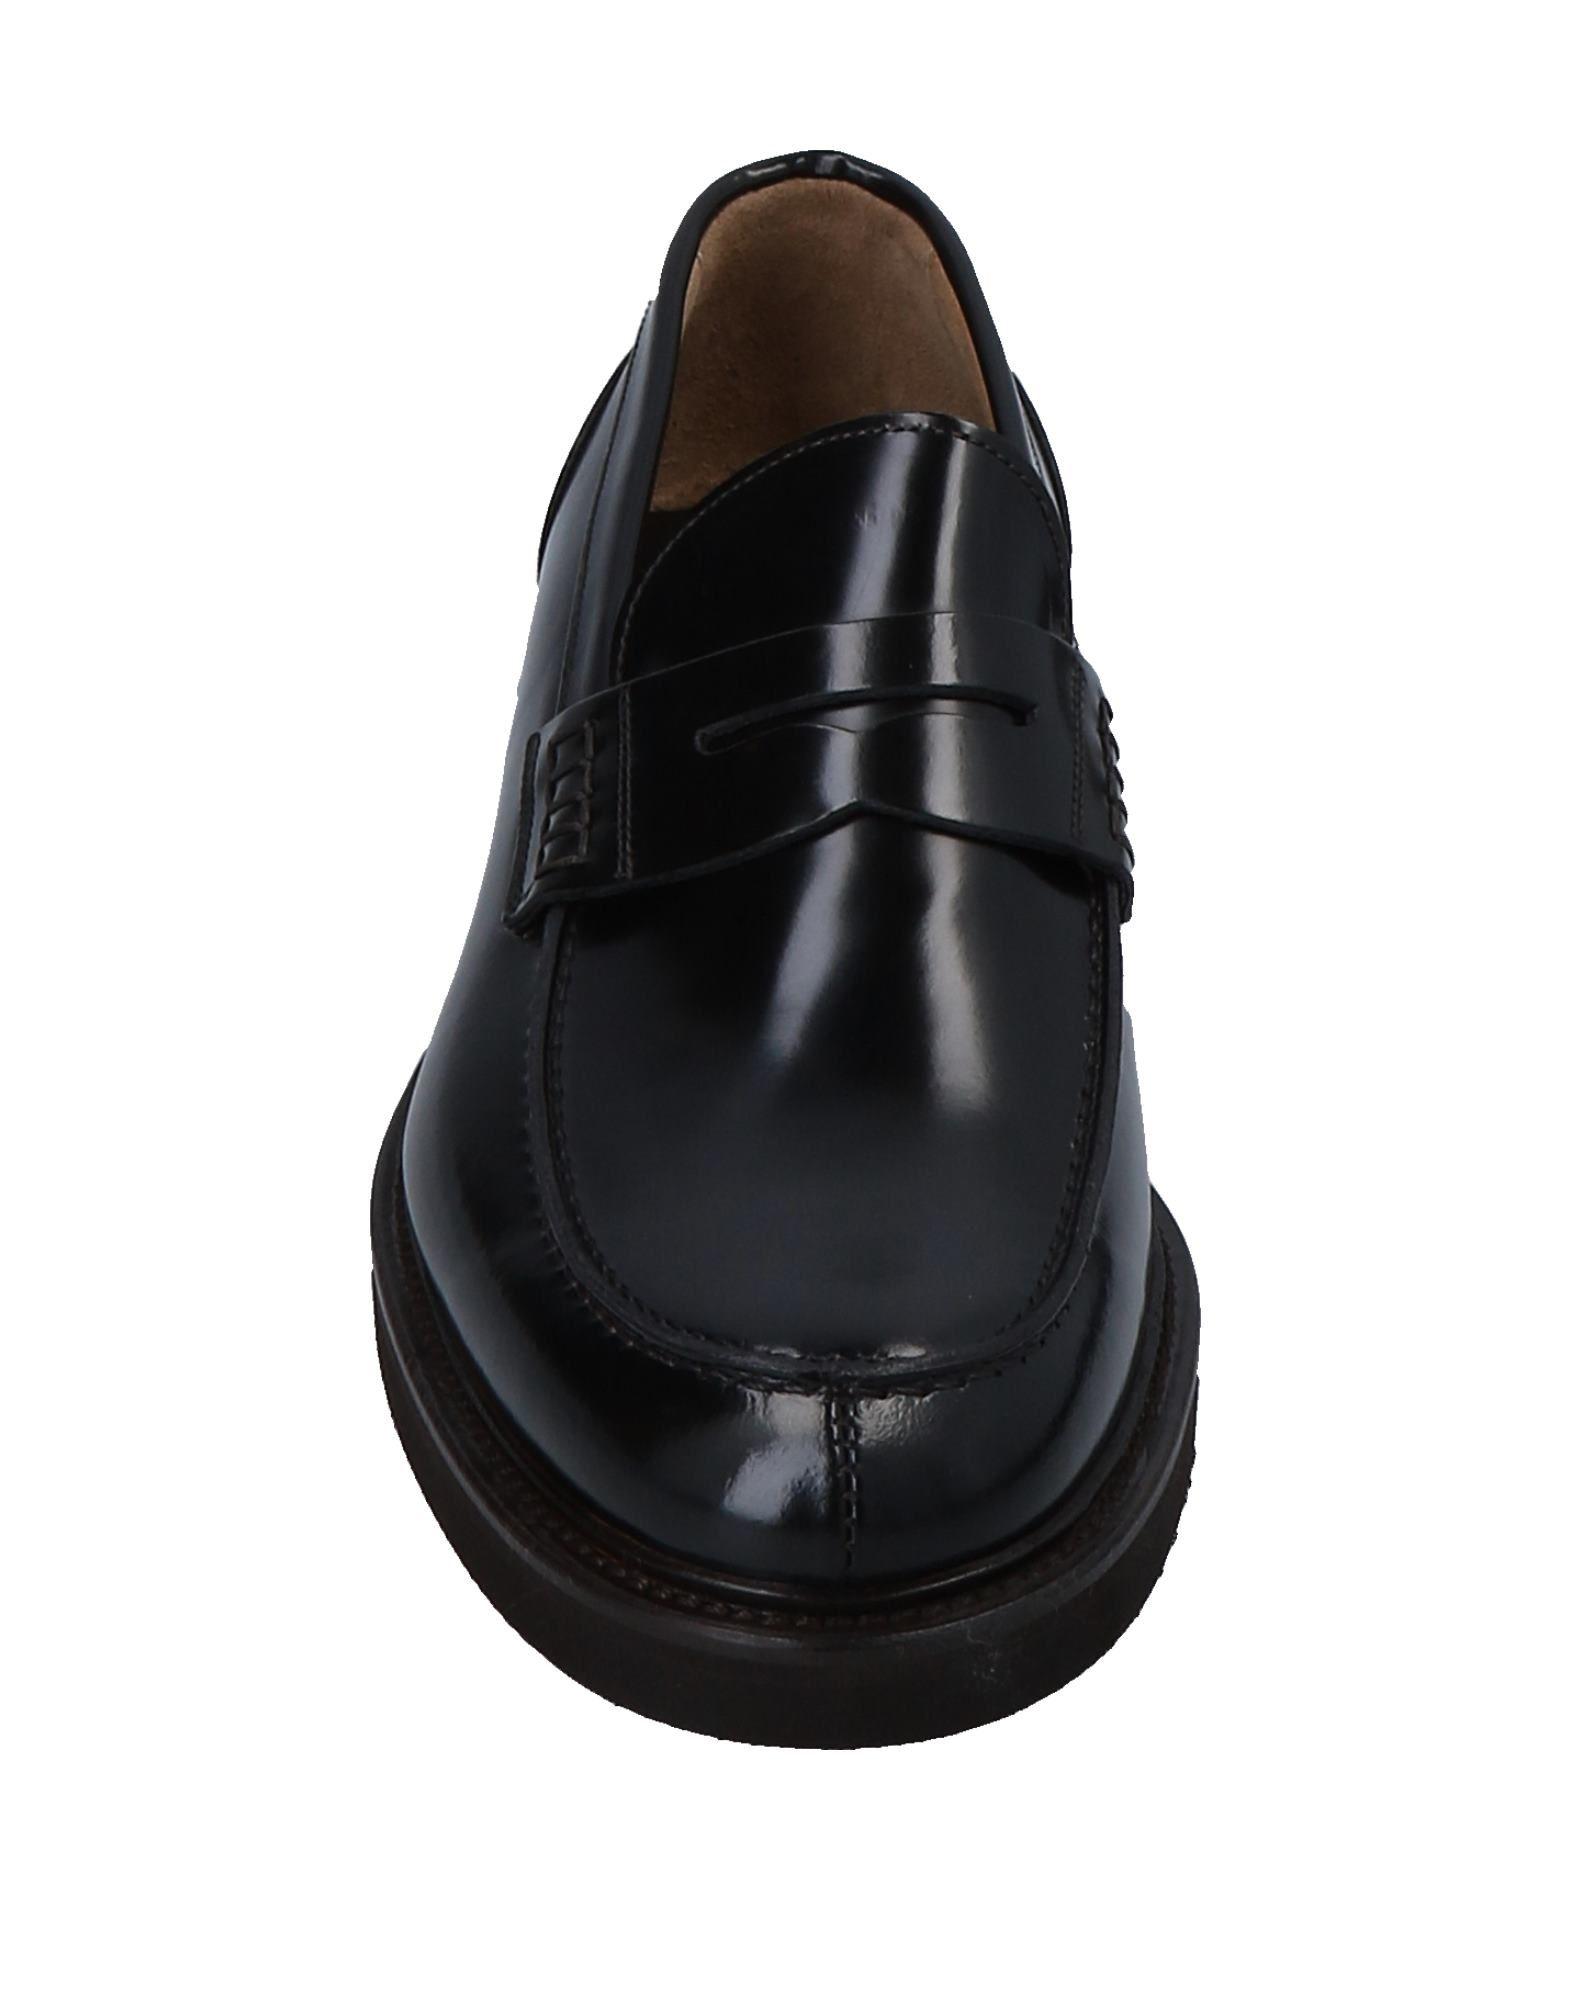 Baldinini 11554344HJ Mokassins Herren  11554344HJ Baldinini Gute Qualität beliebte Schuhe 75525a